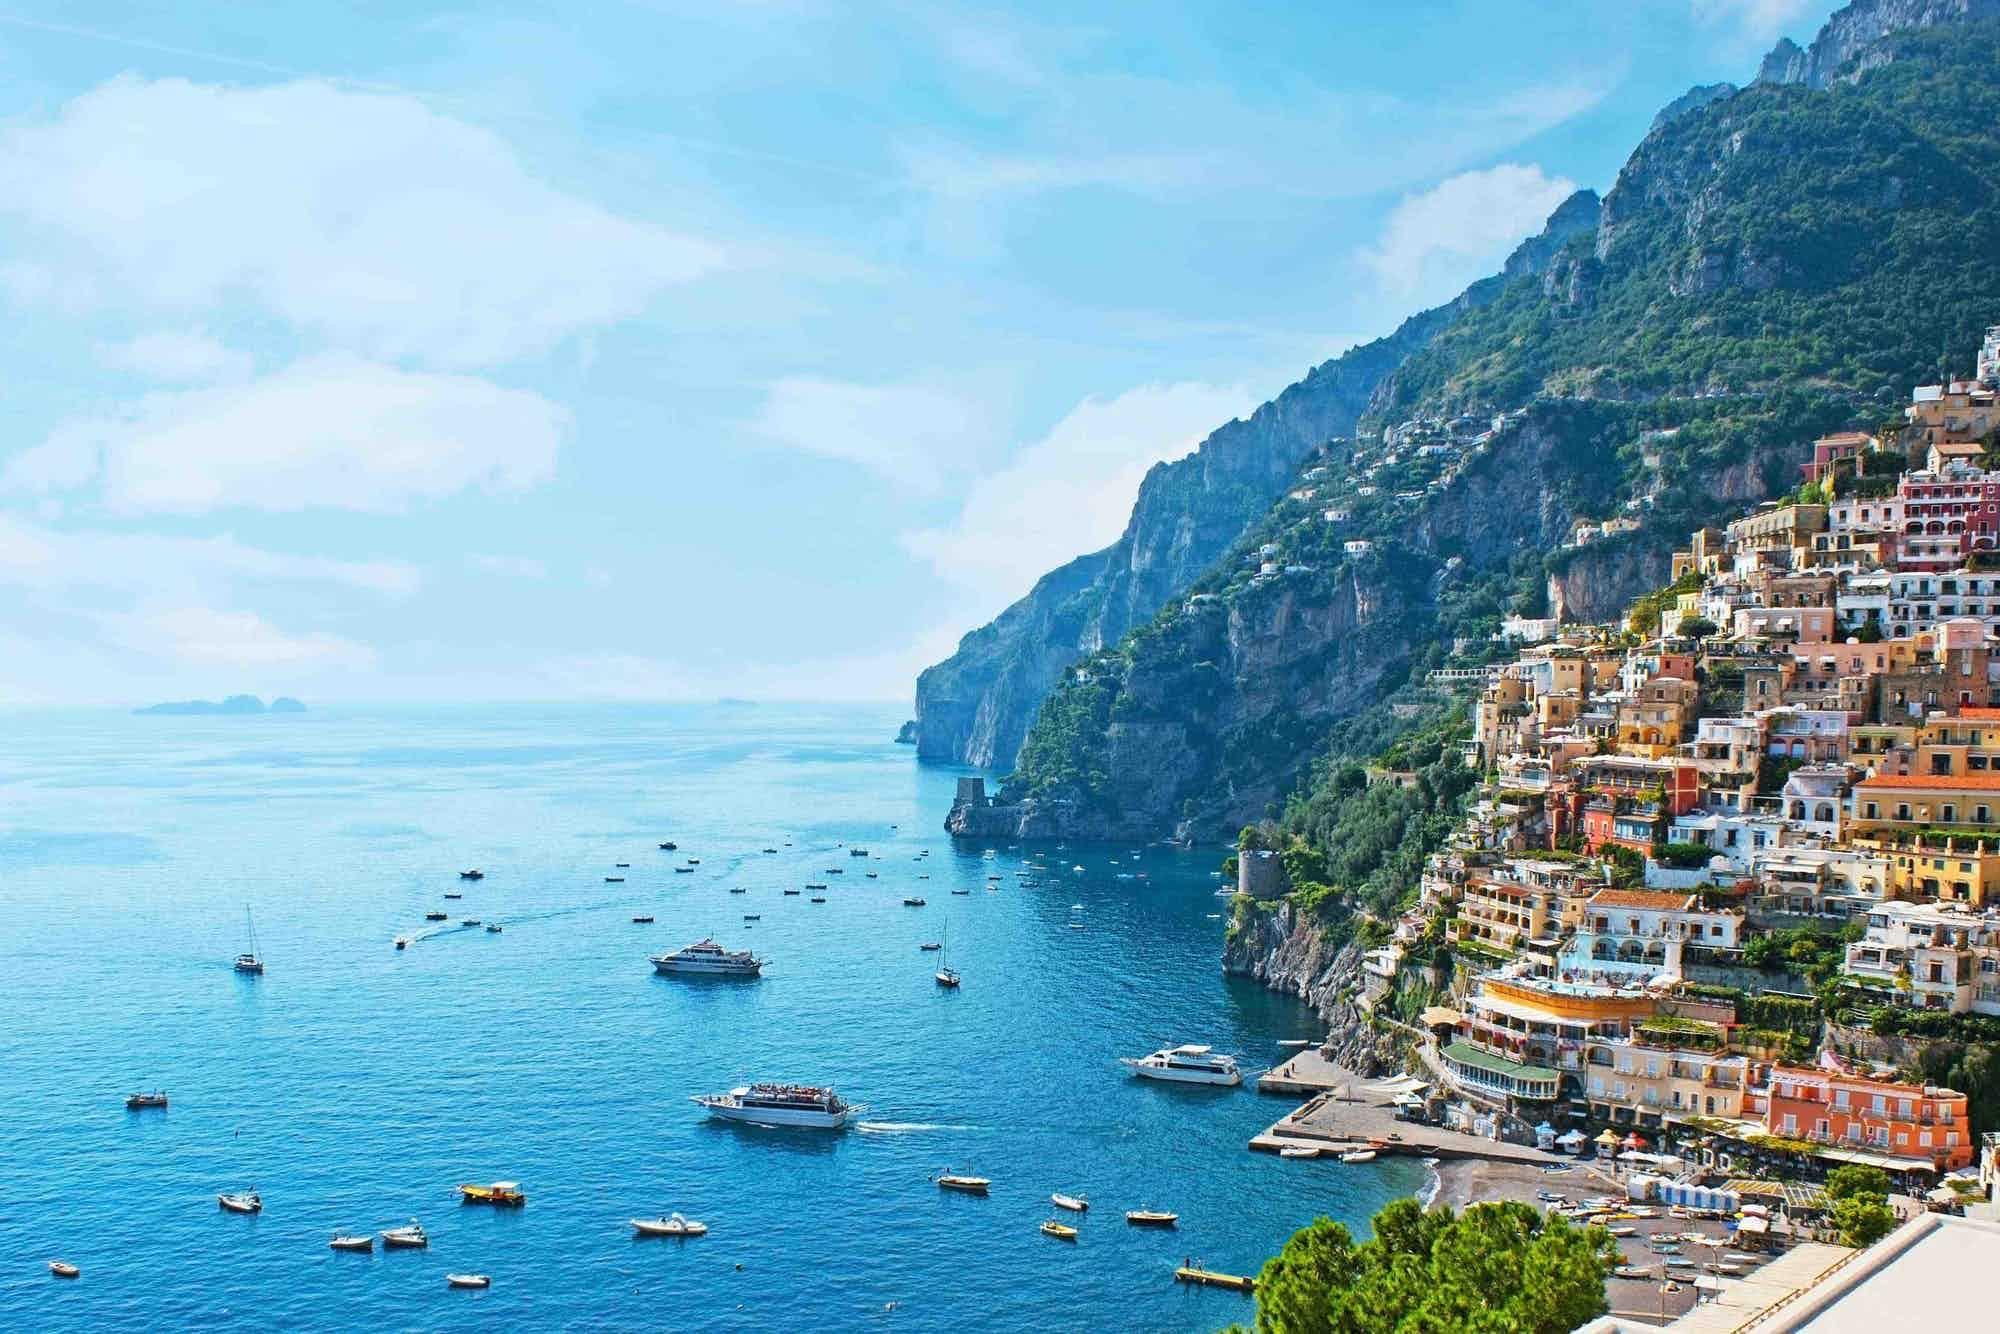 Campervan hire near Amalfi Coast for scenic vews of of seaside